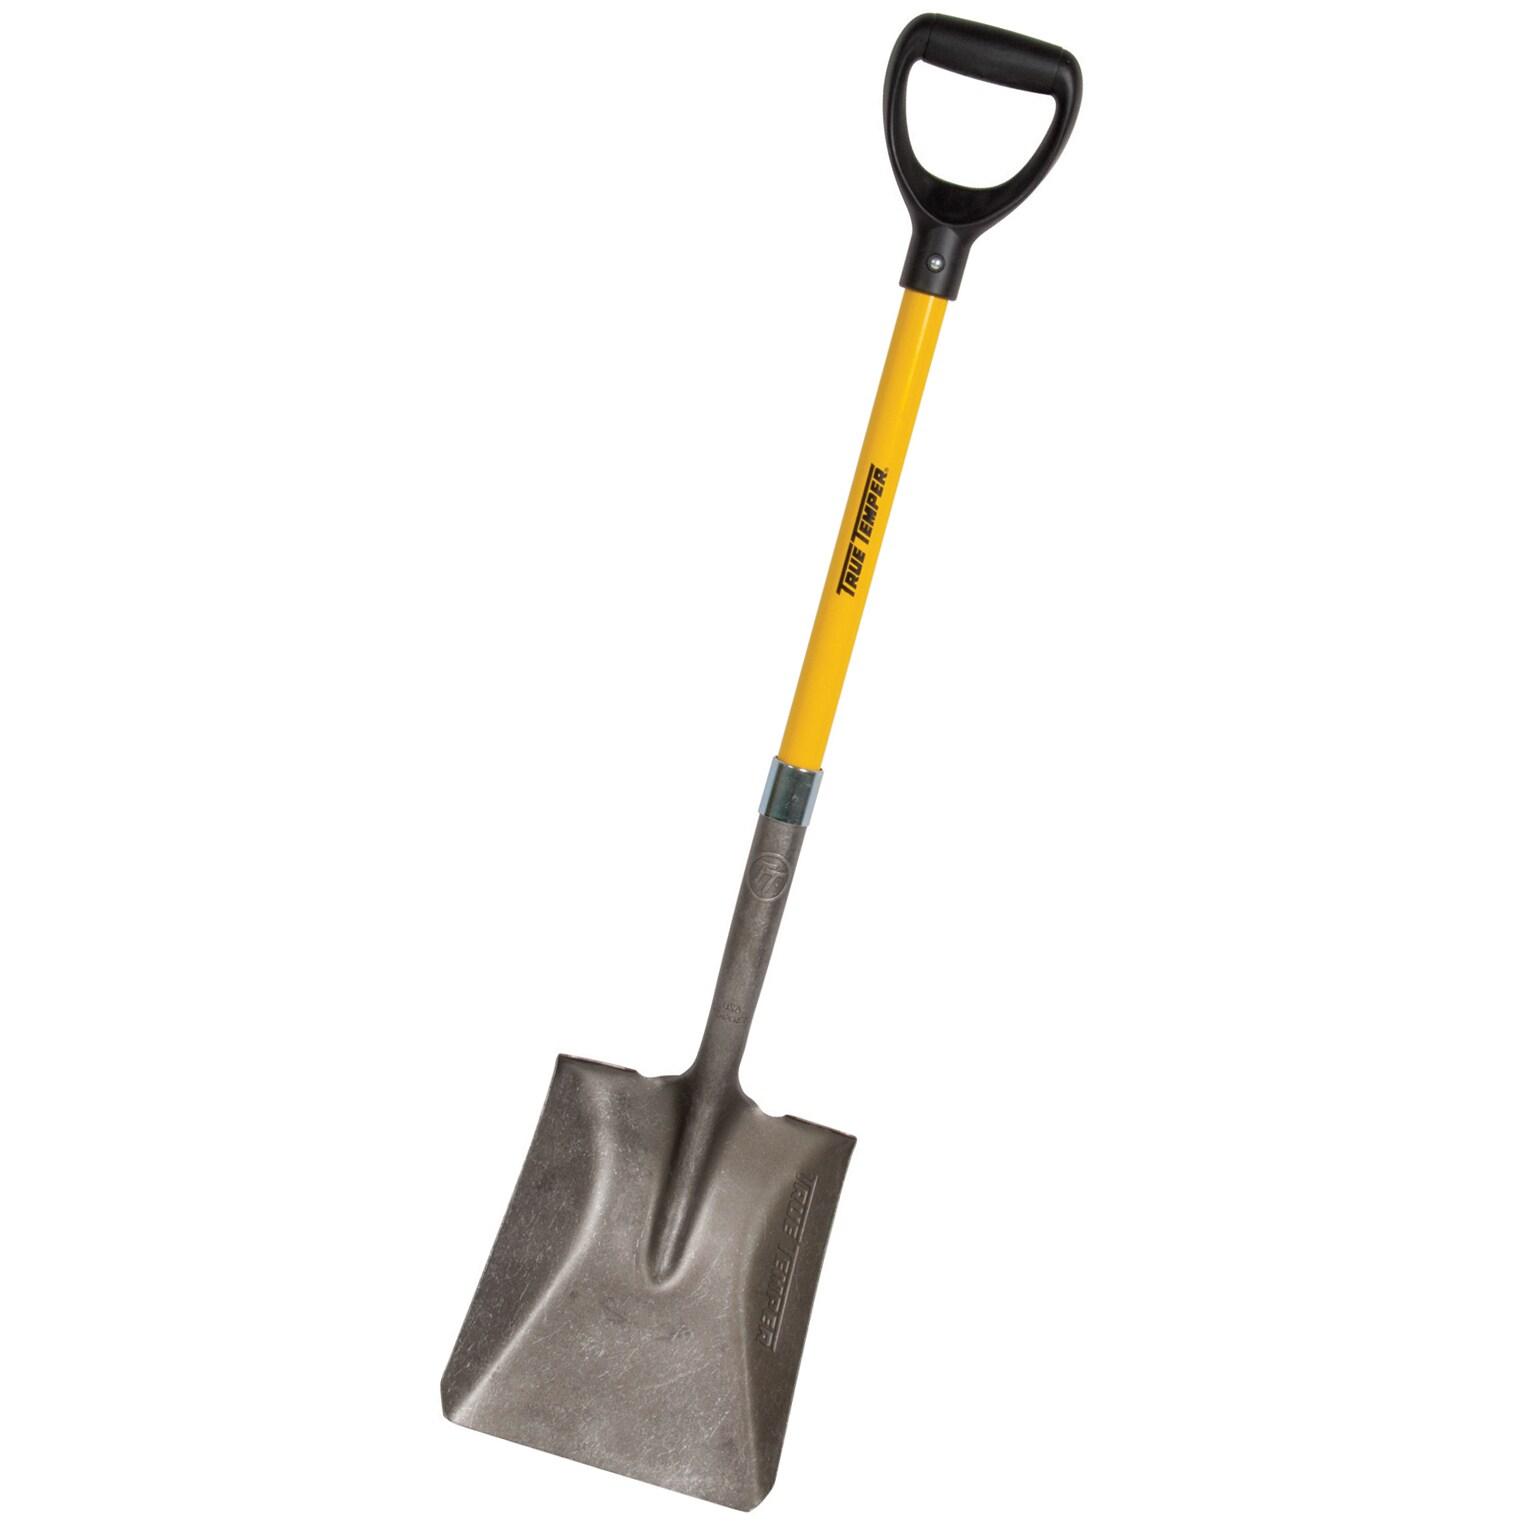 AMES 163034800 16 Gauge Steel Square Shovel With Fibergla...